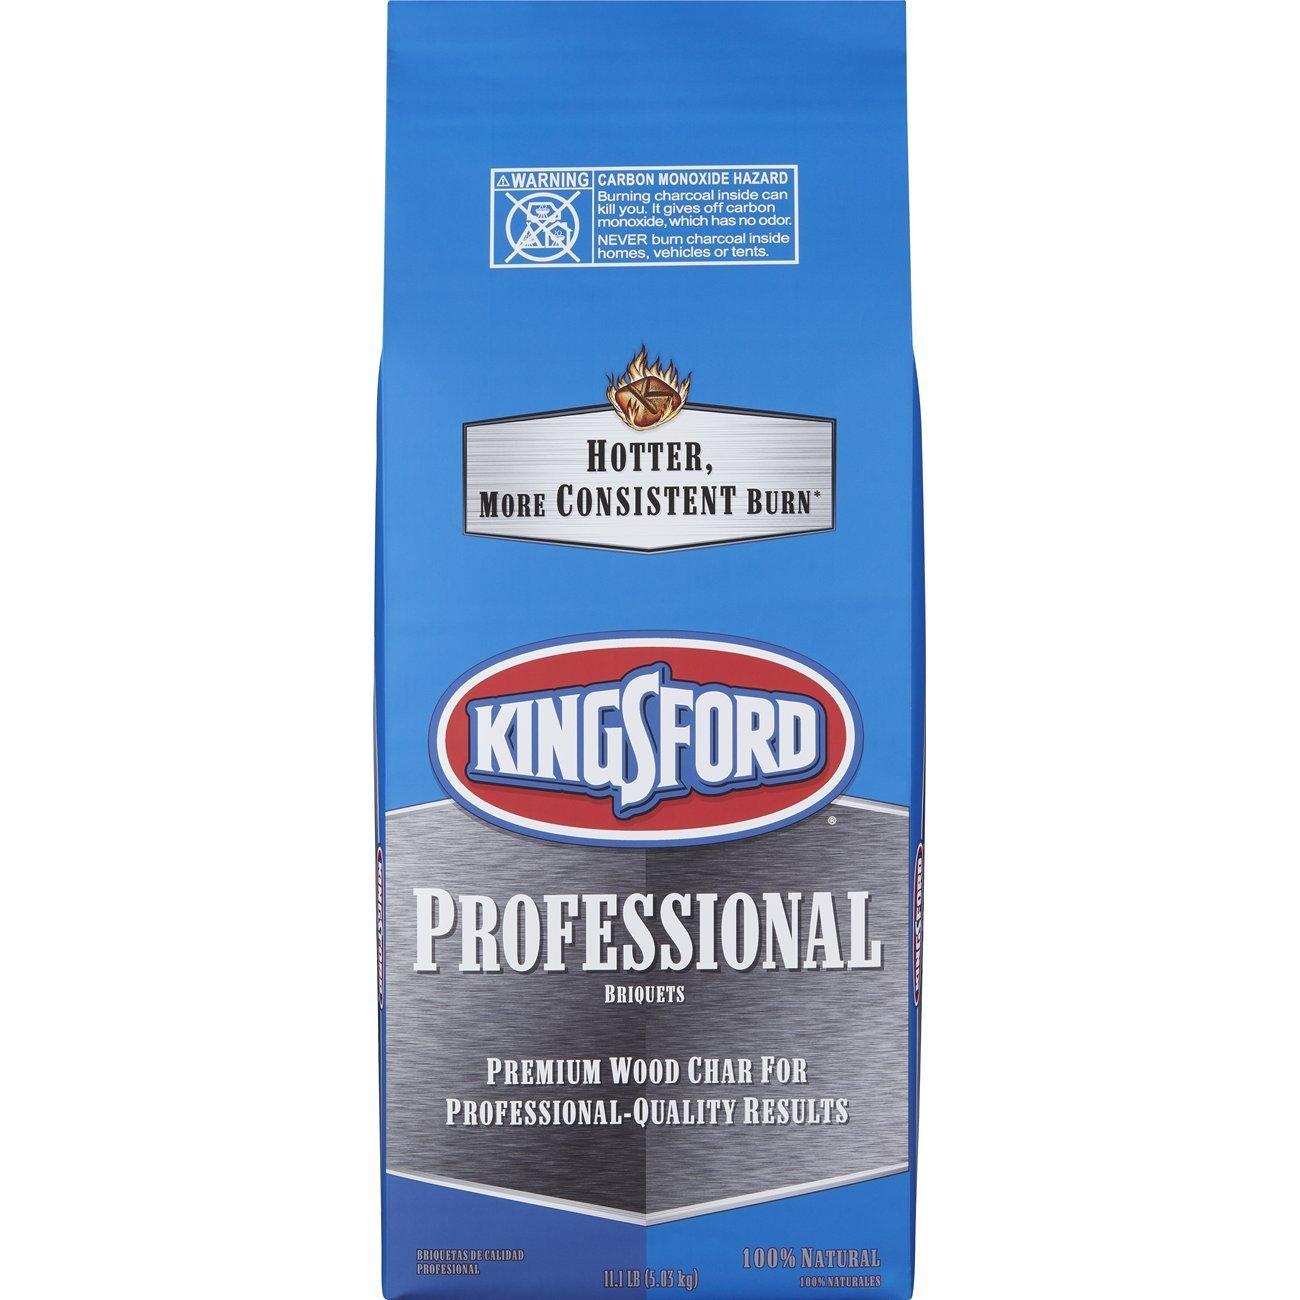 Kingsford Charcoal Professional Briquettes, 11.1 Pounds 30520